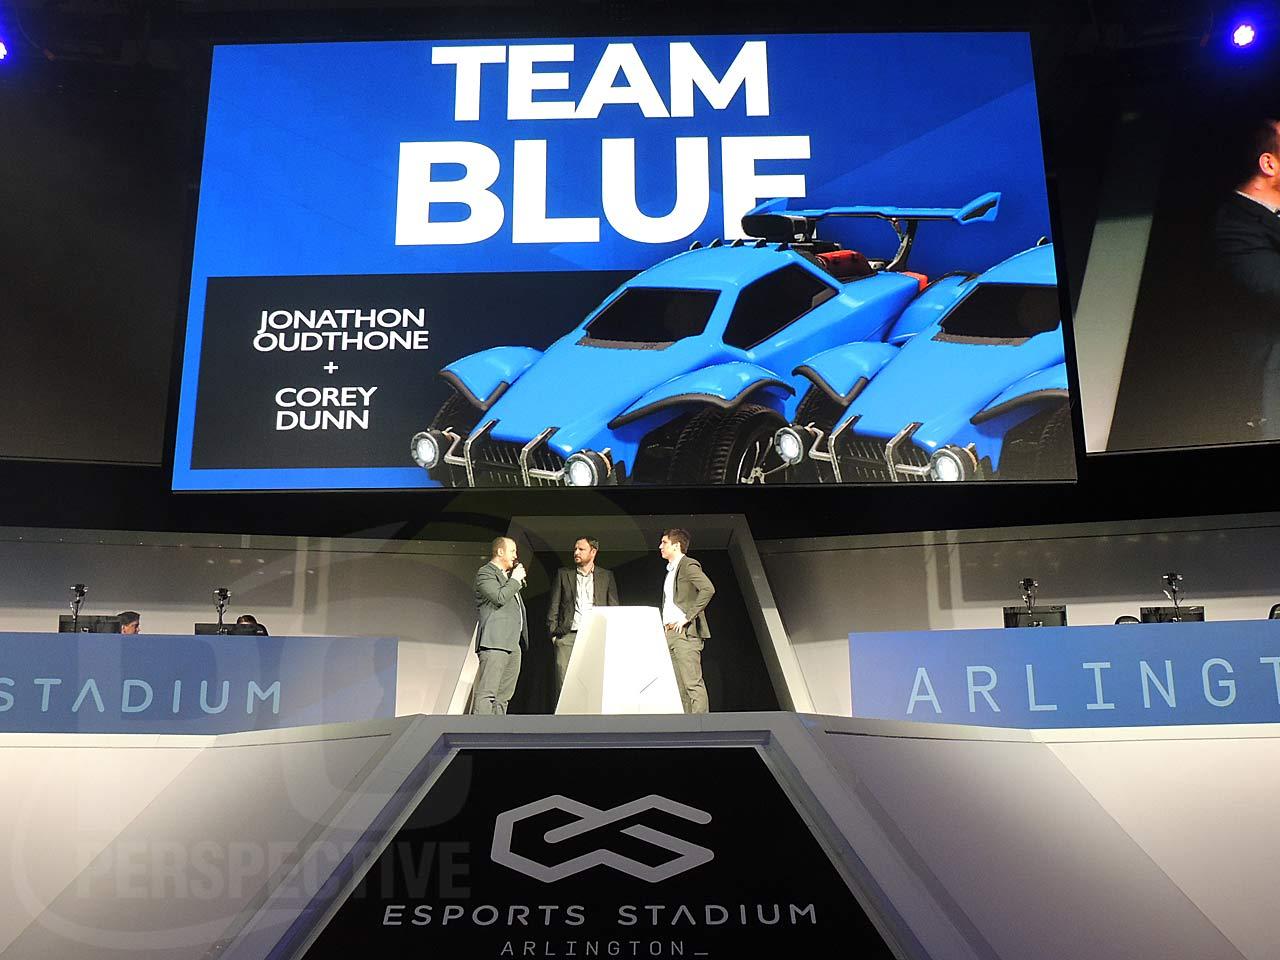 21-esport-stadium-play-team-blue.jpg